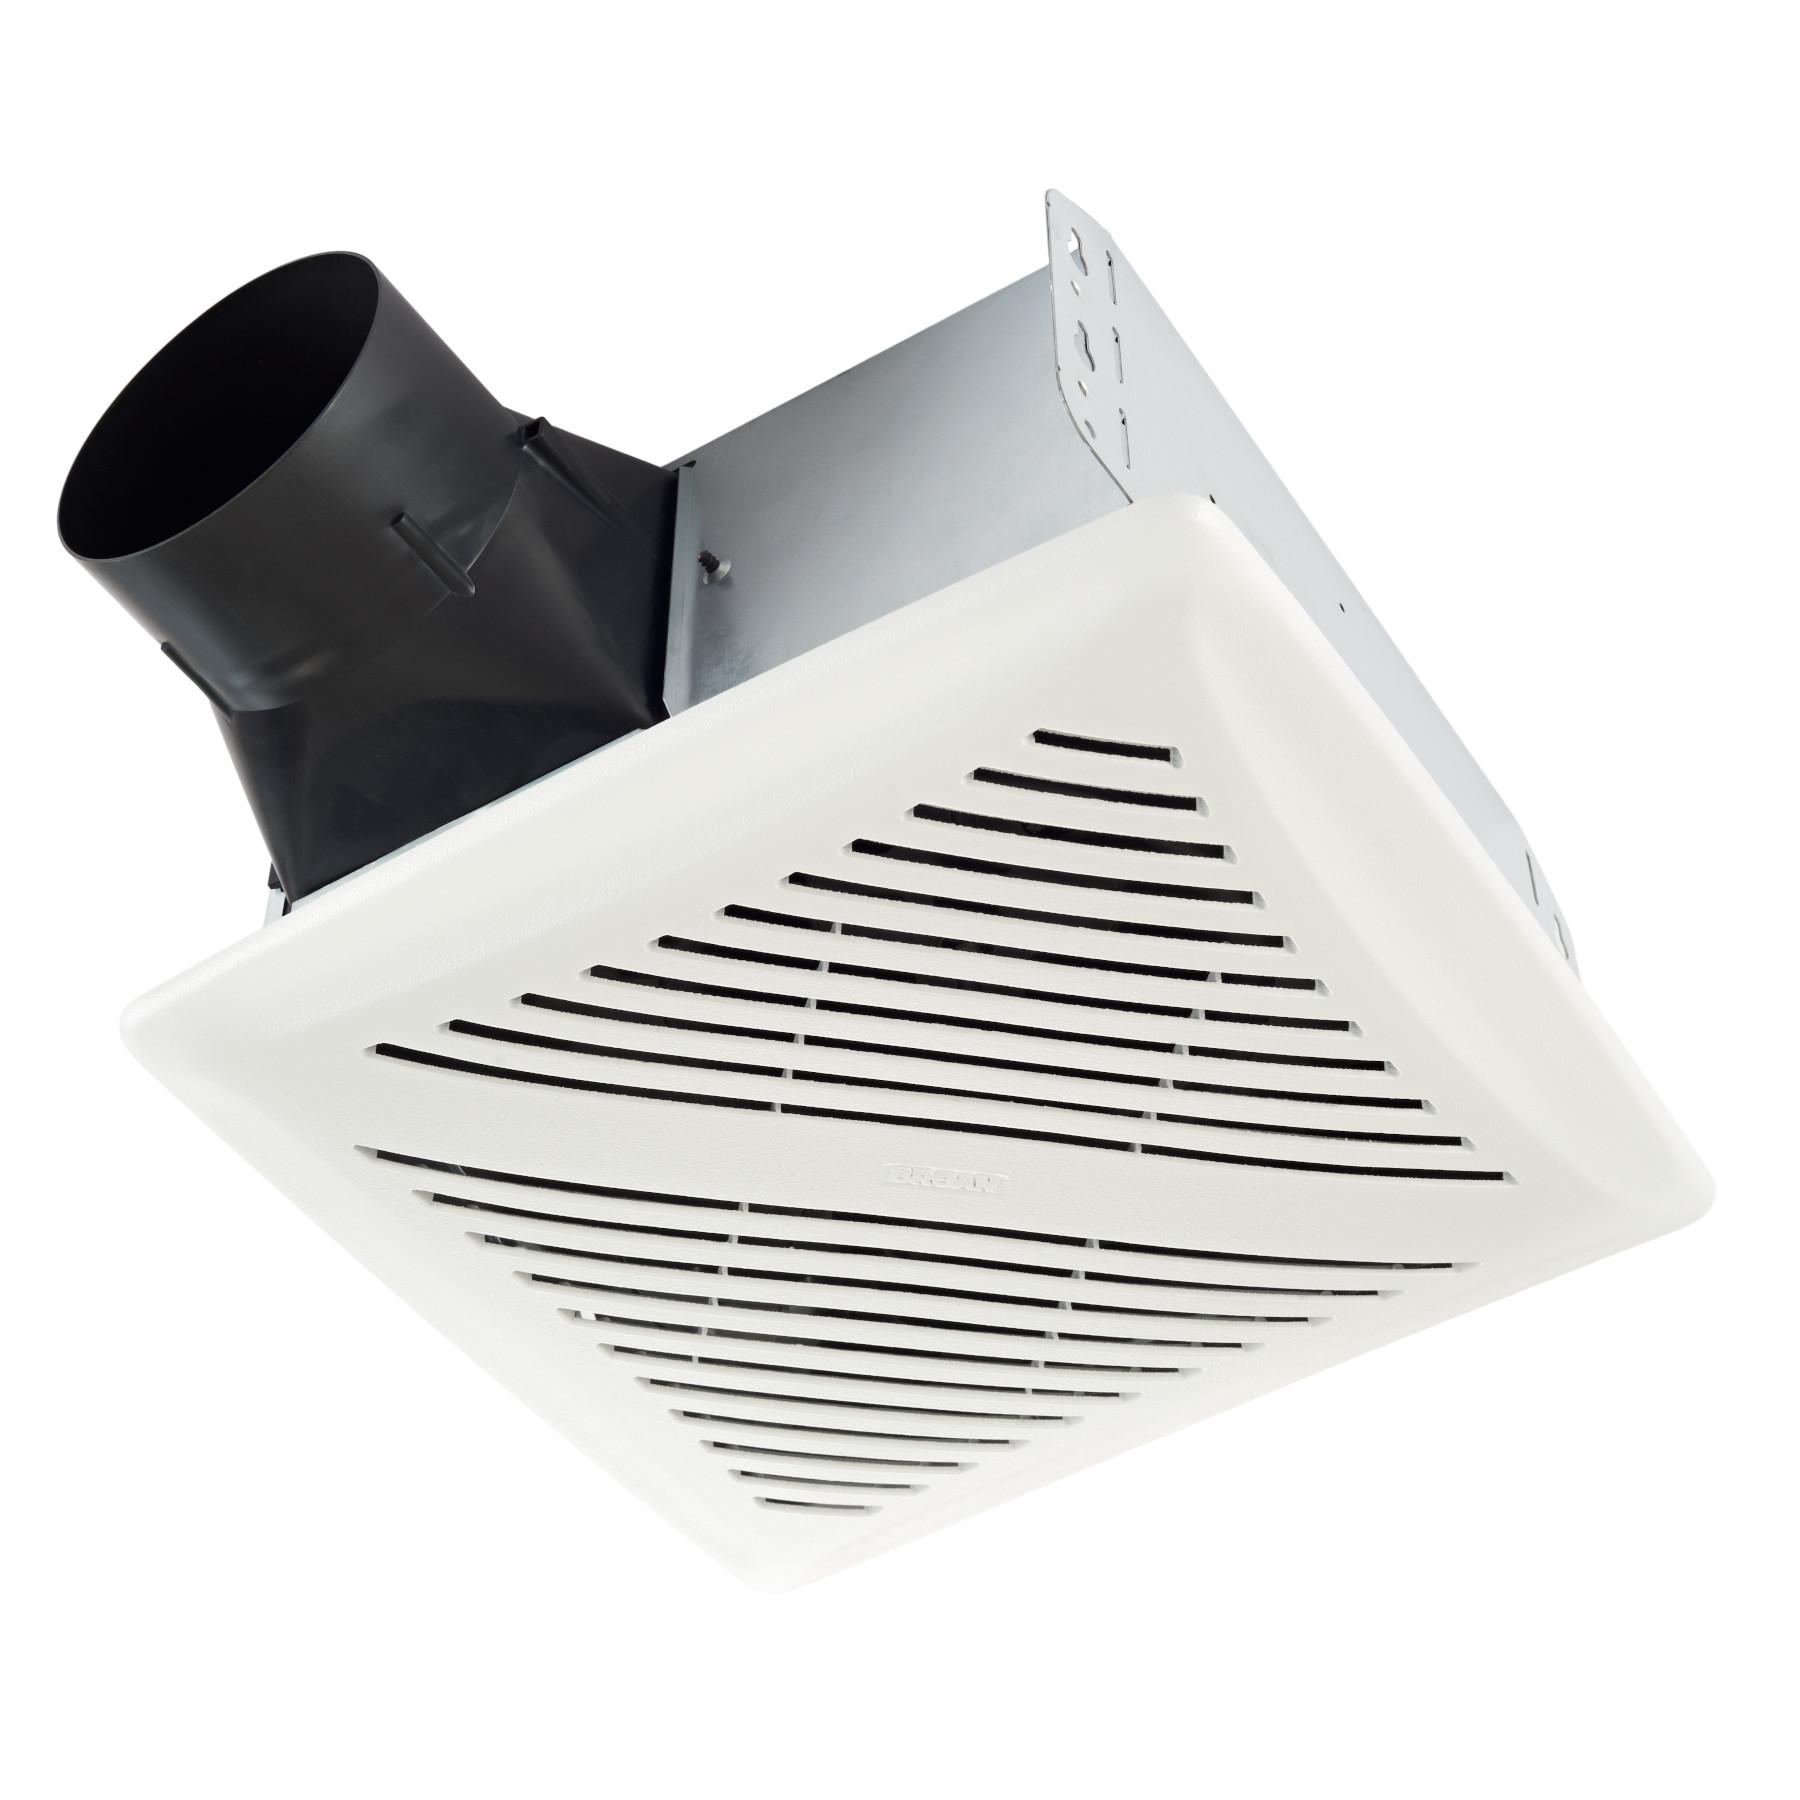 Ae50110dcs Broan Humidity Sensing Bathroom Exhaust Fan Energy Star 50 110 Cfm